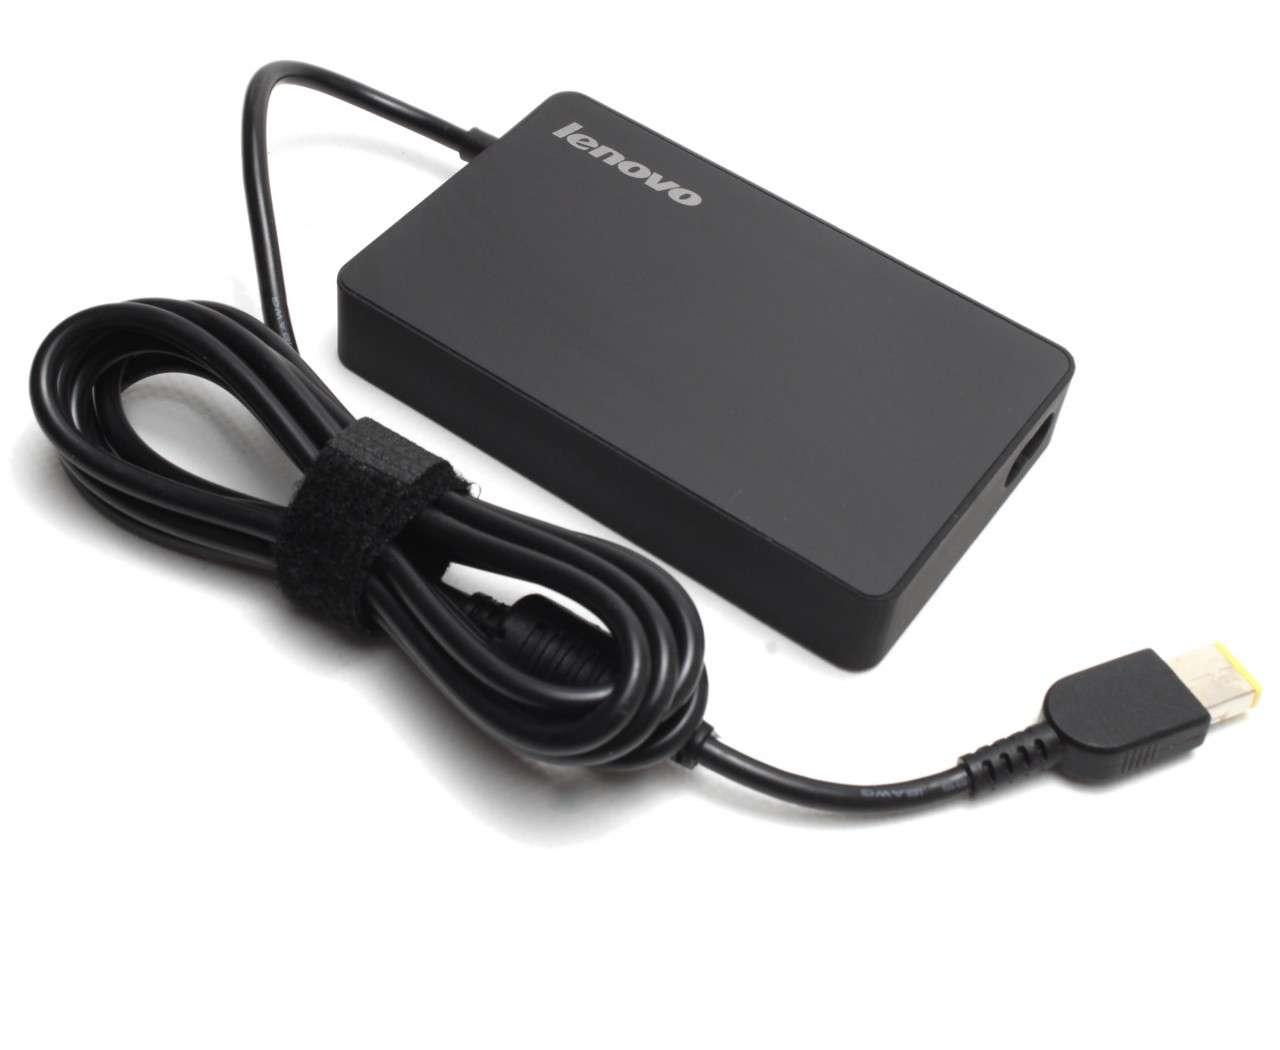 Incarcator Lenovo G505 80AA 65W imagine powerlaptop.ro 2021